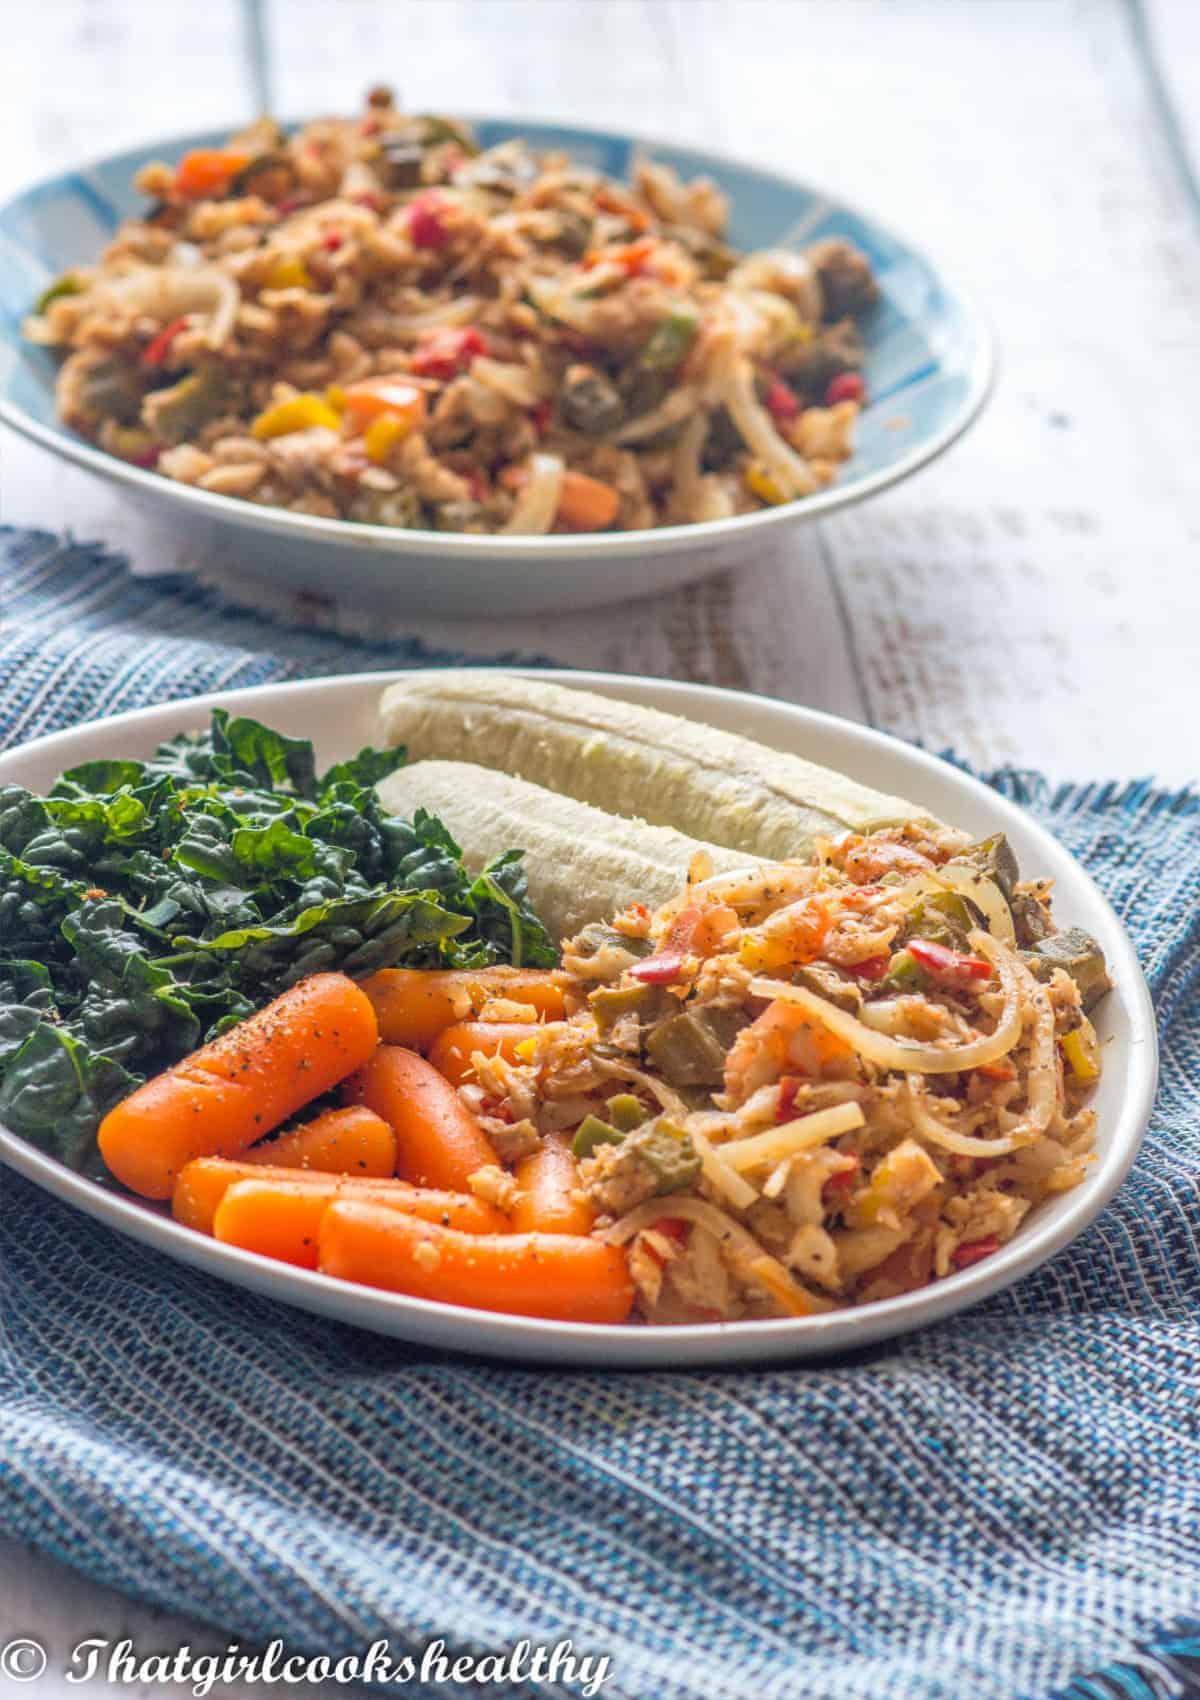 saltfish with vegetables